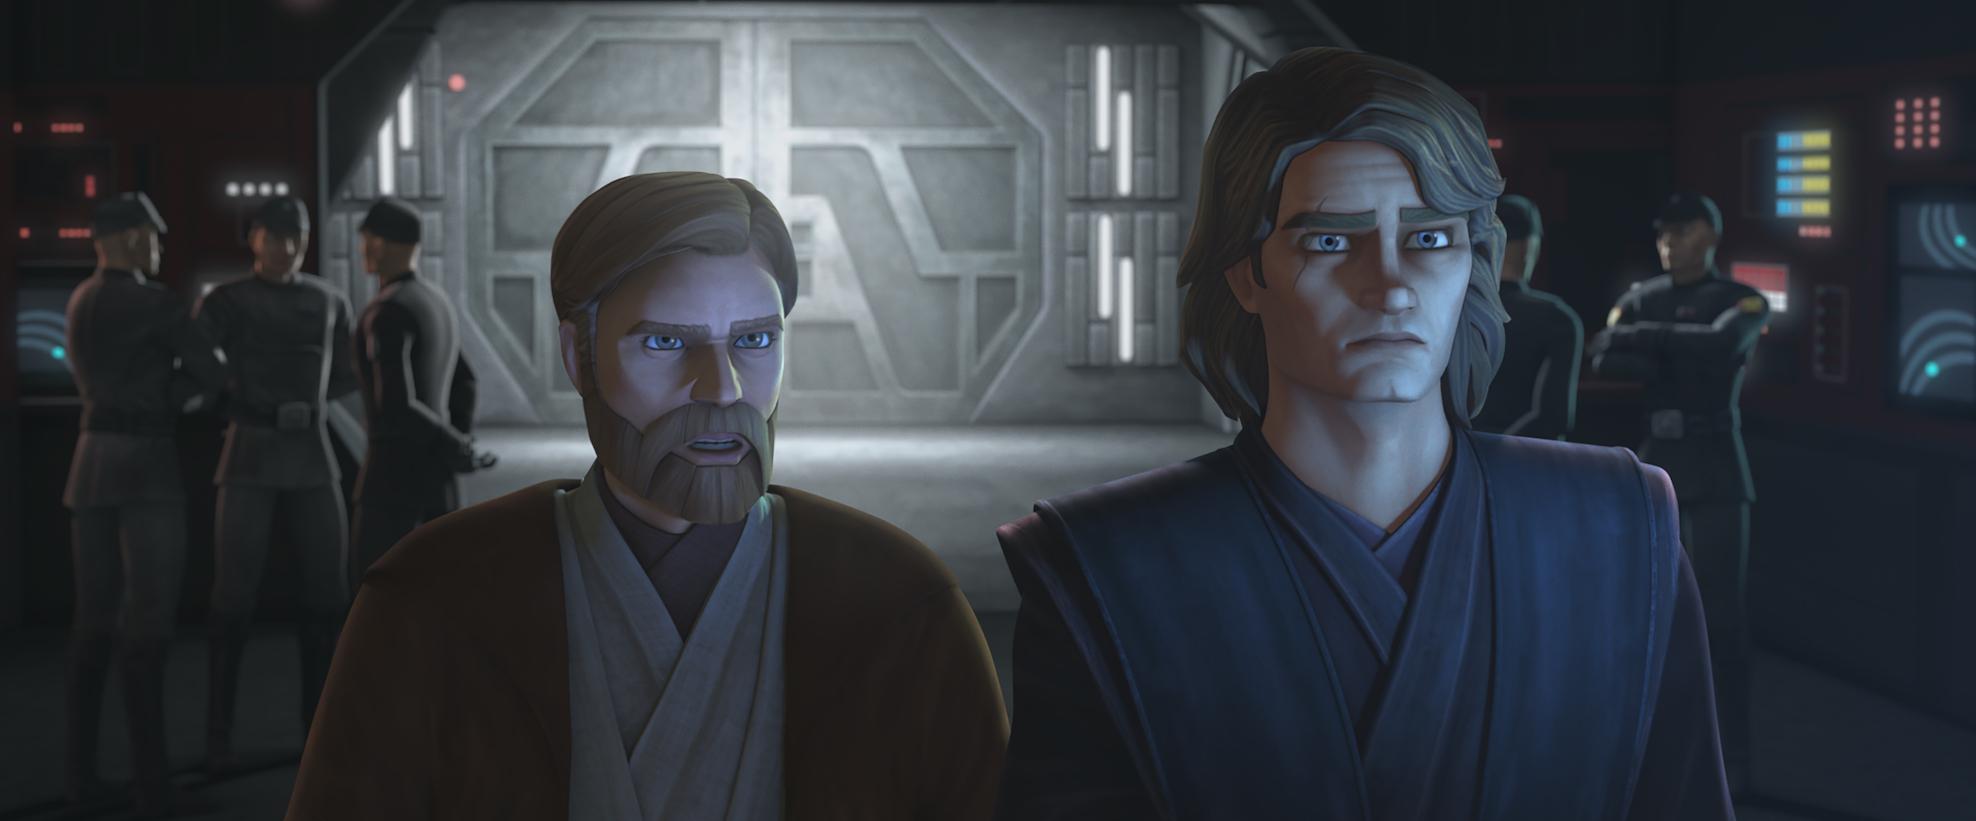 Obi-Wan Kenobi and Anakin Skywalker in 'The Clone Wars' Season 7.